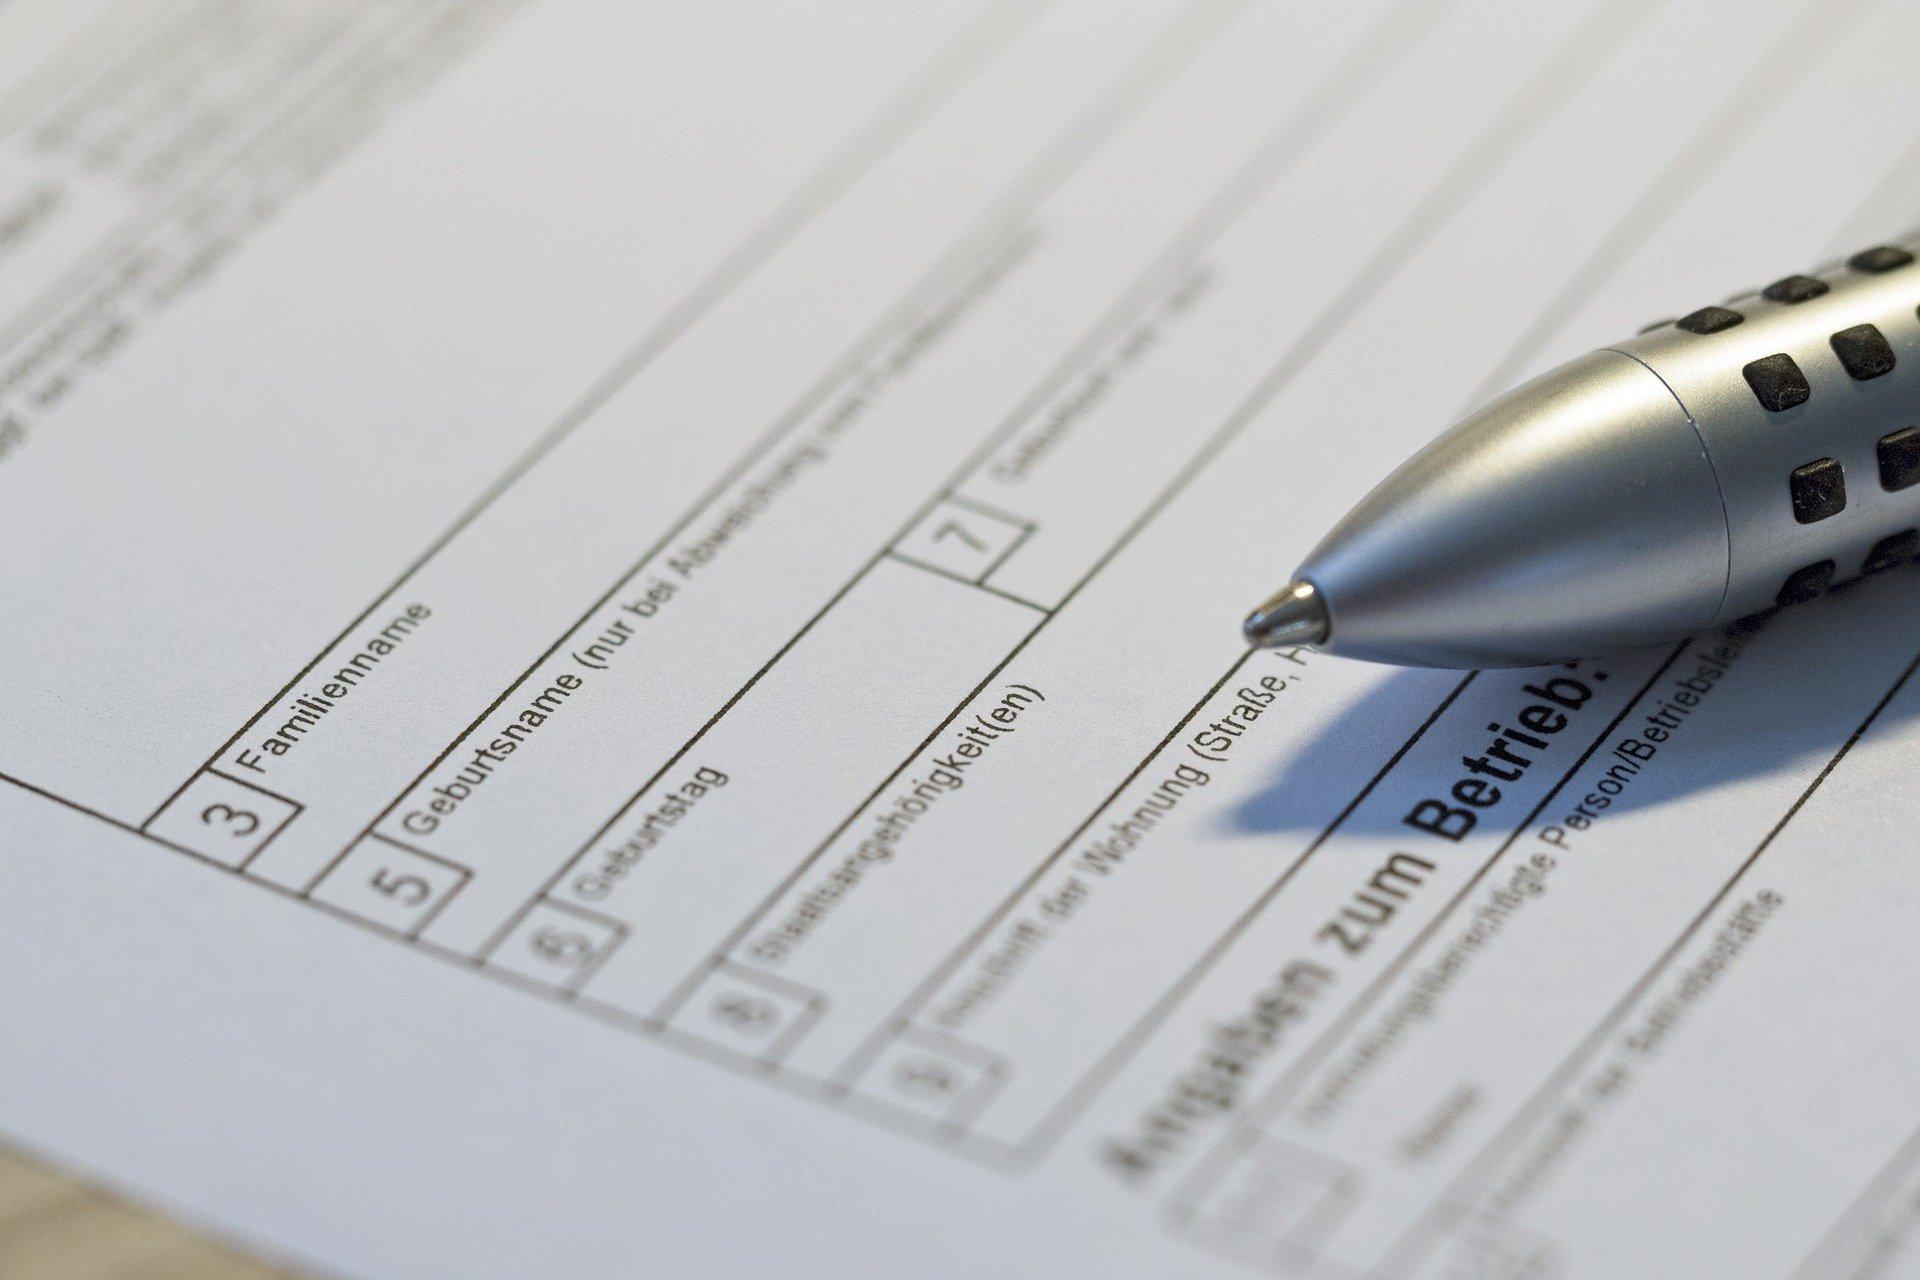 antragsservice sozialrecht kanzlei rechtsberatung hannover